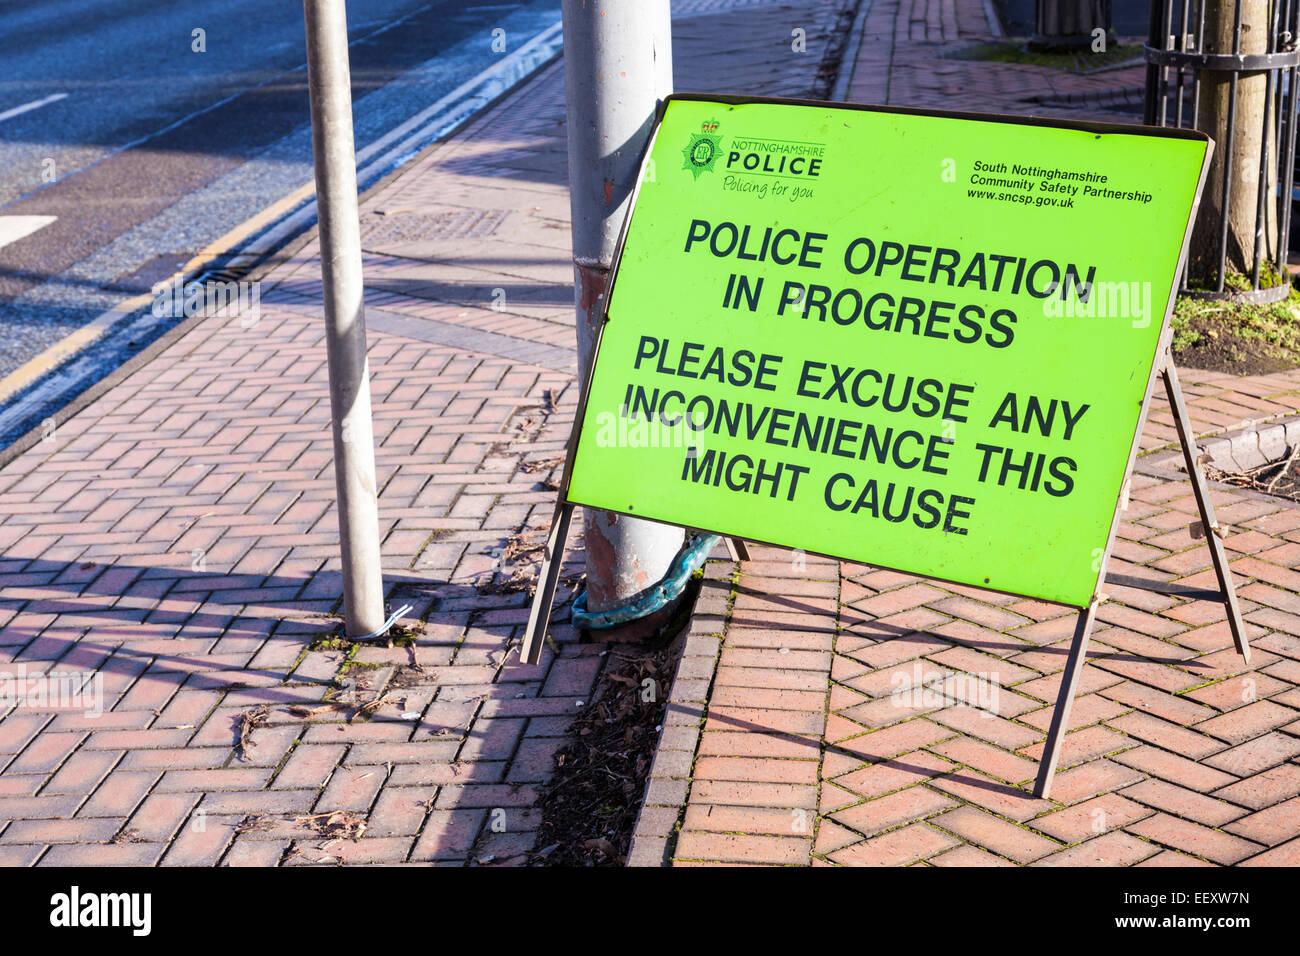 Police operation in progress sign, Nottinghamshire, England, UK - Stock Image